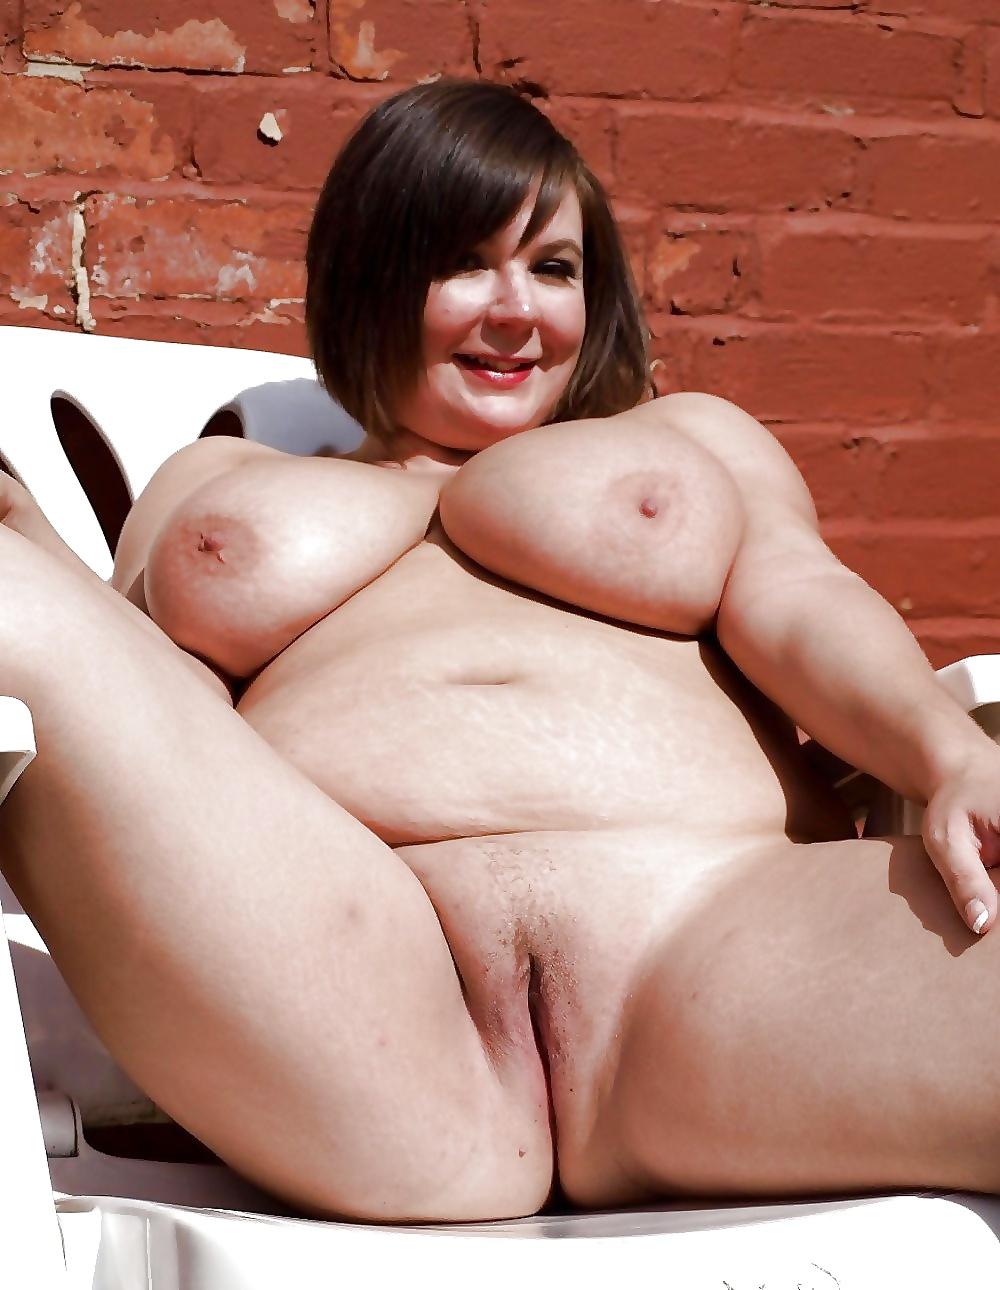 Mommy Bbw Chubby Fat Mature Mom In Fat Huge Cocks, Curvy Bbw Nude Public